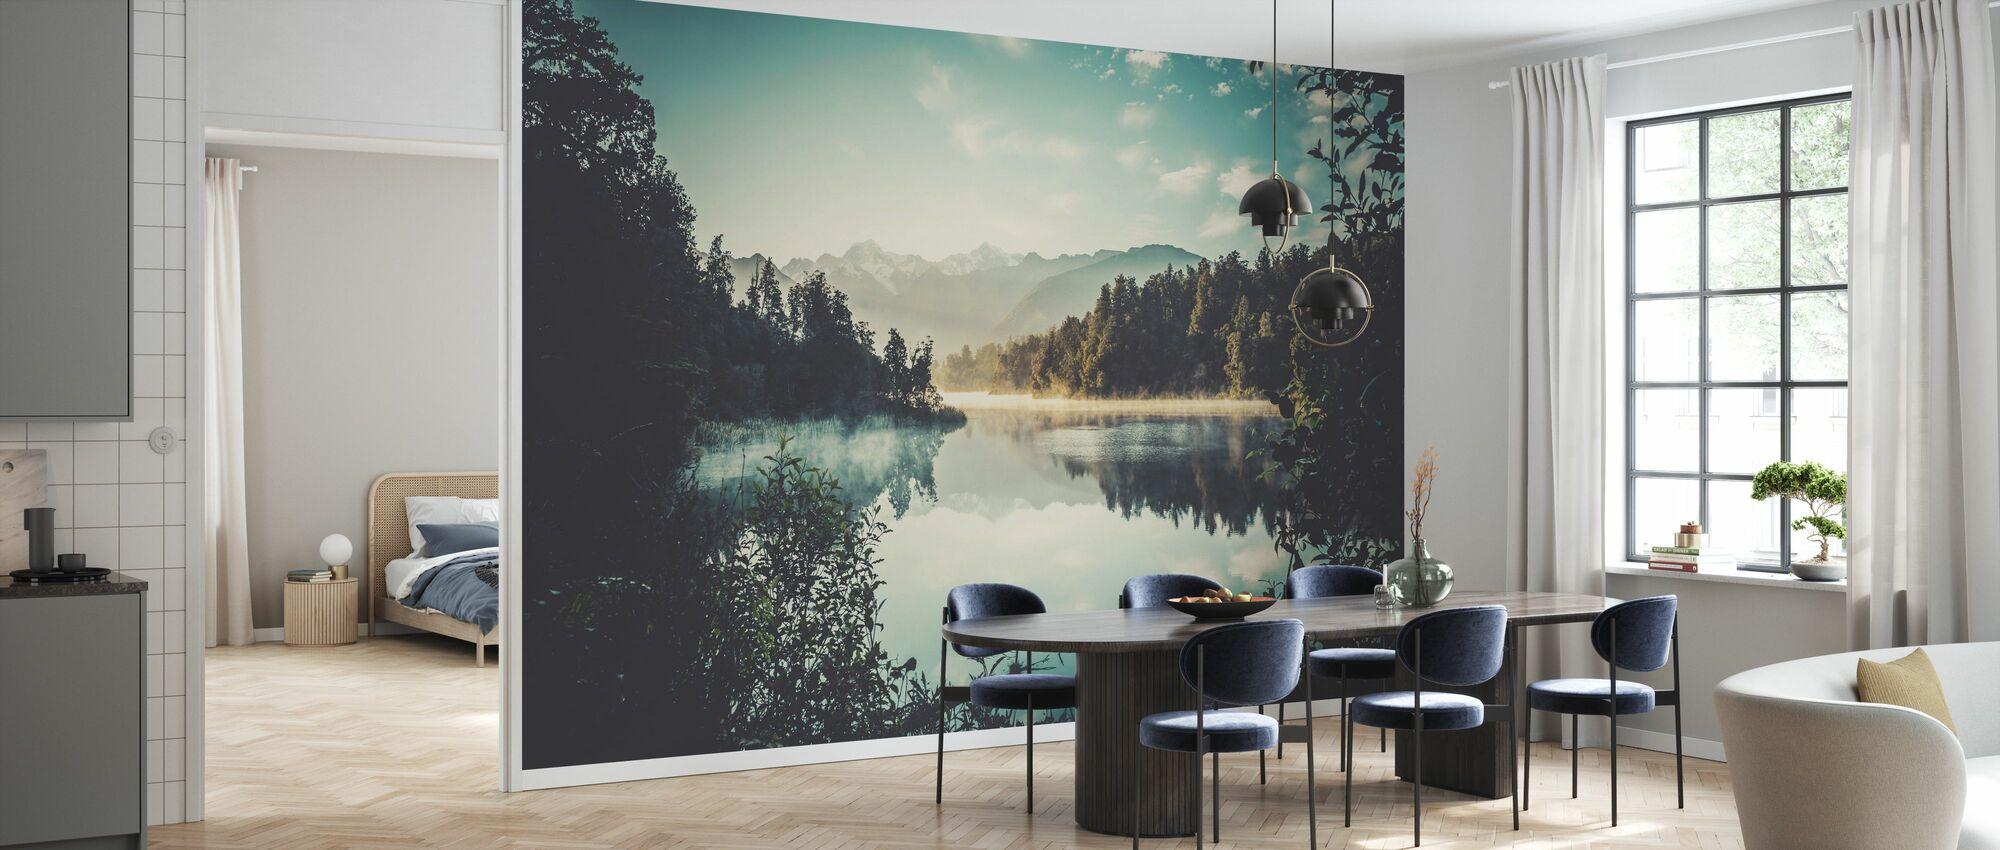 Lake Matheson at Sunrise - Wallpaper - Kitchen